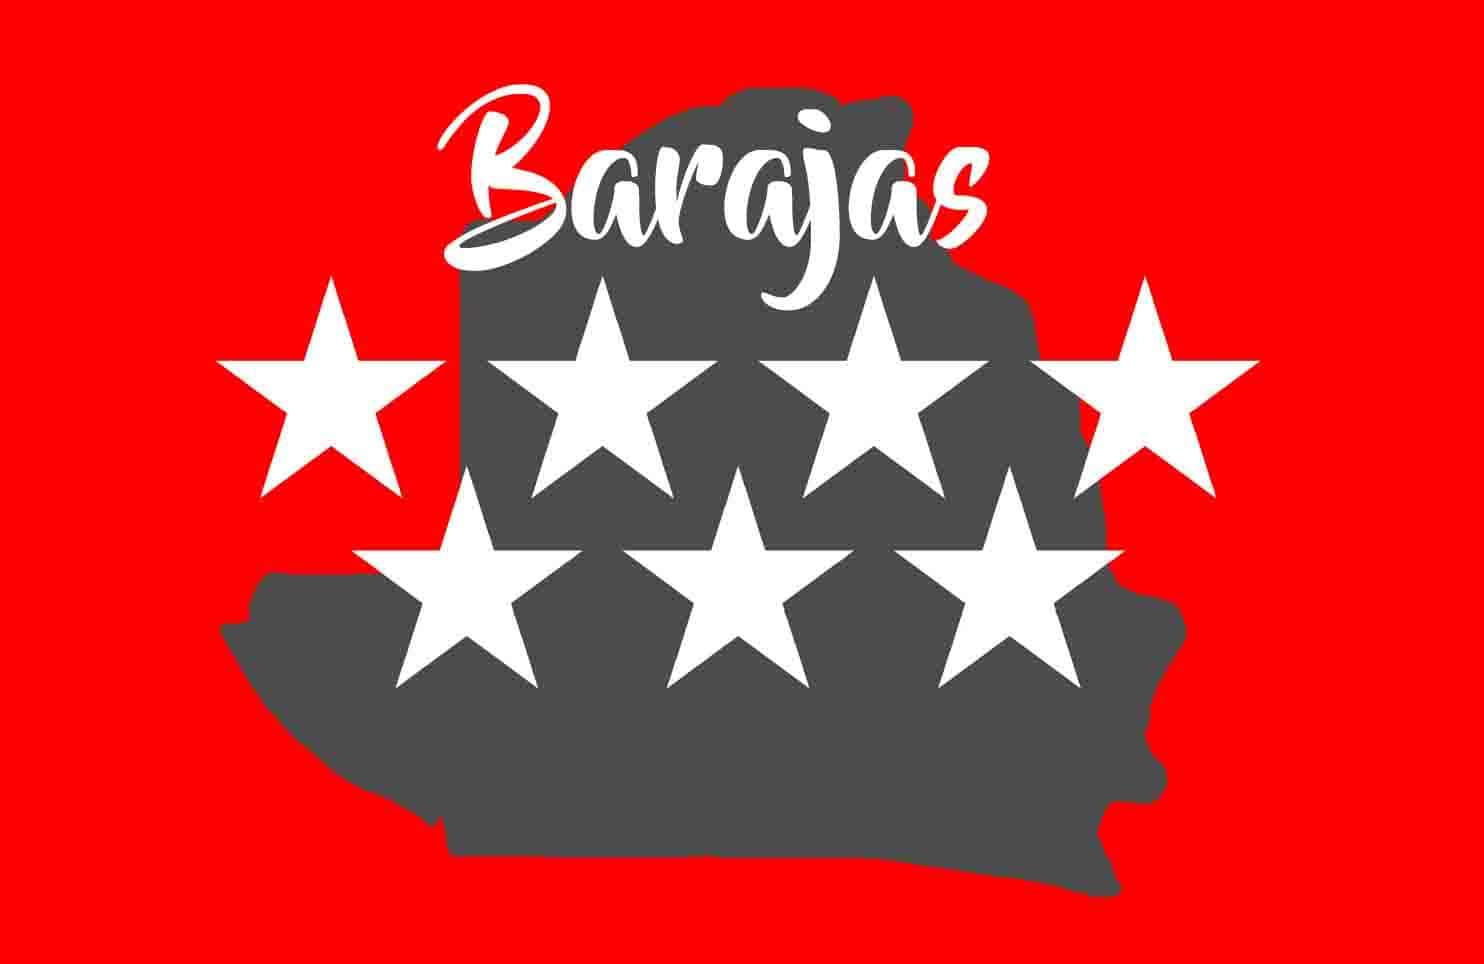 alquiler de autocares de 30 plazas microbus minibus madrid barajas